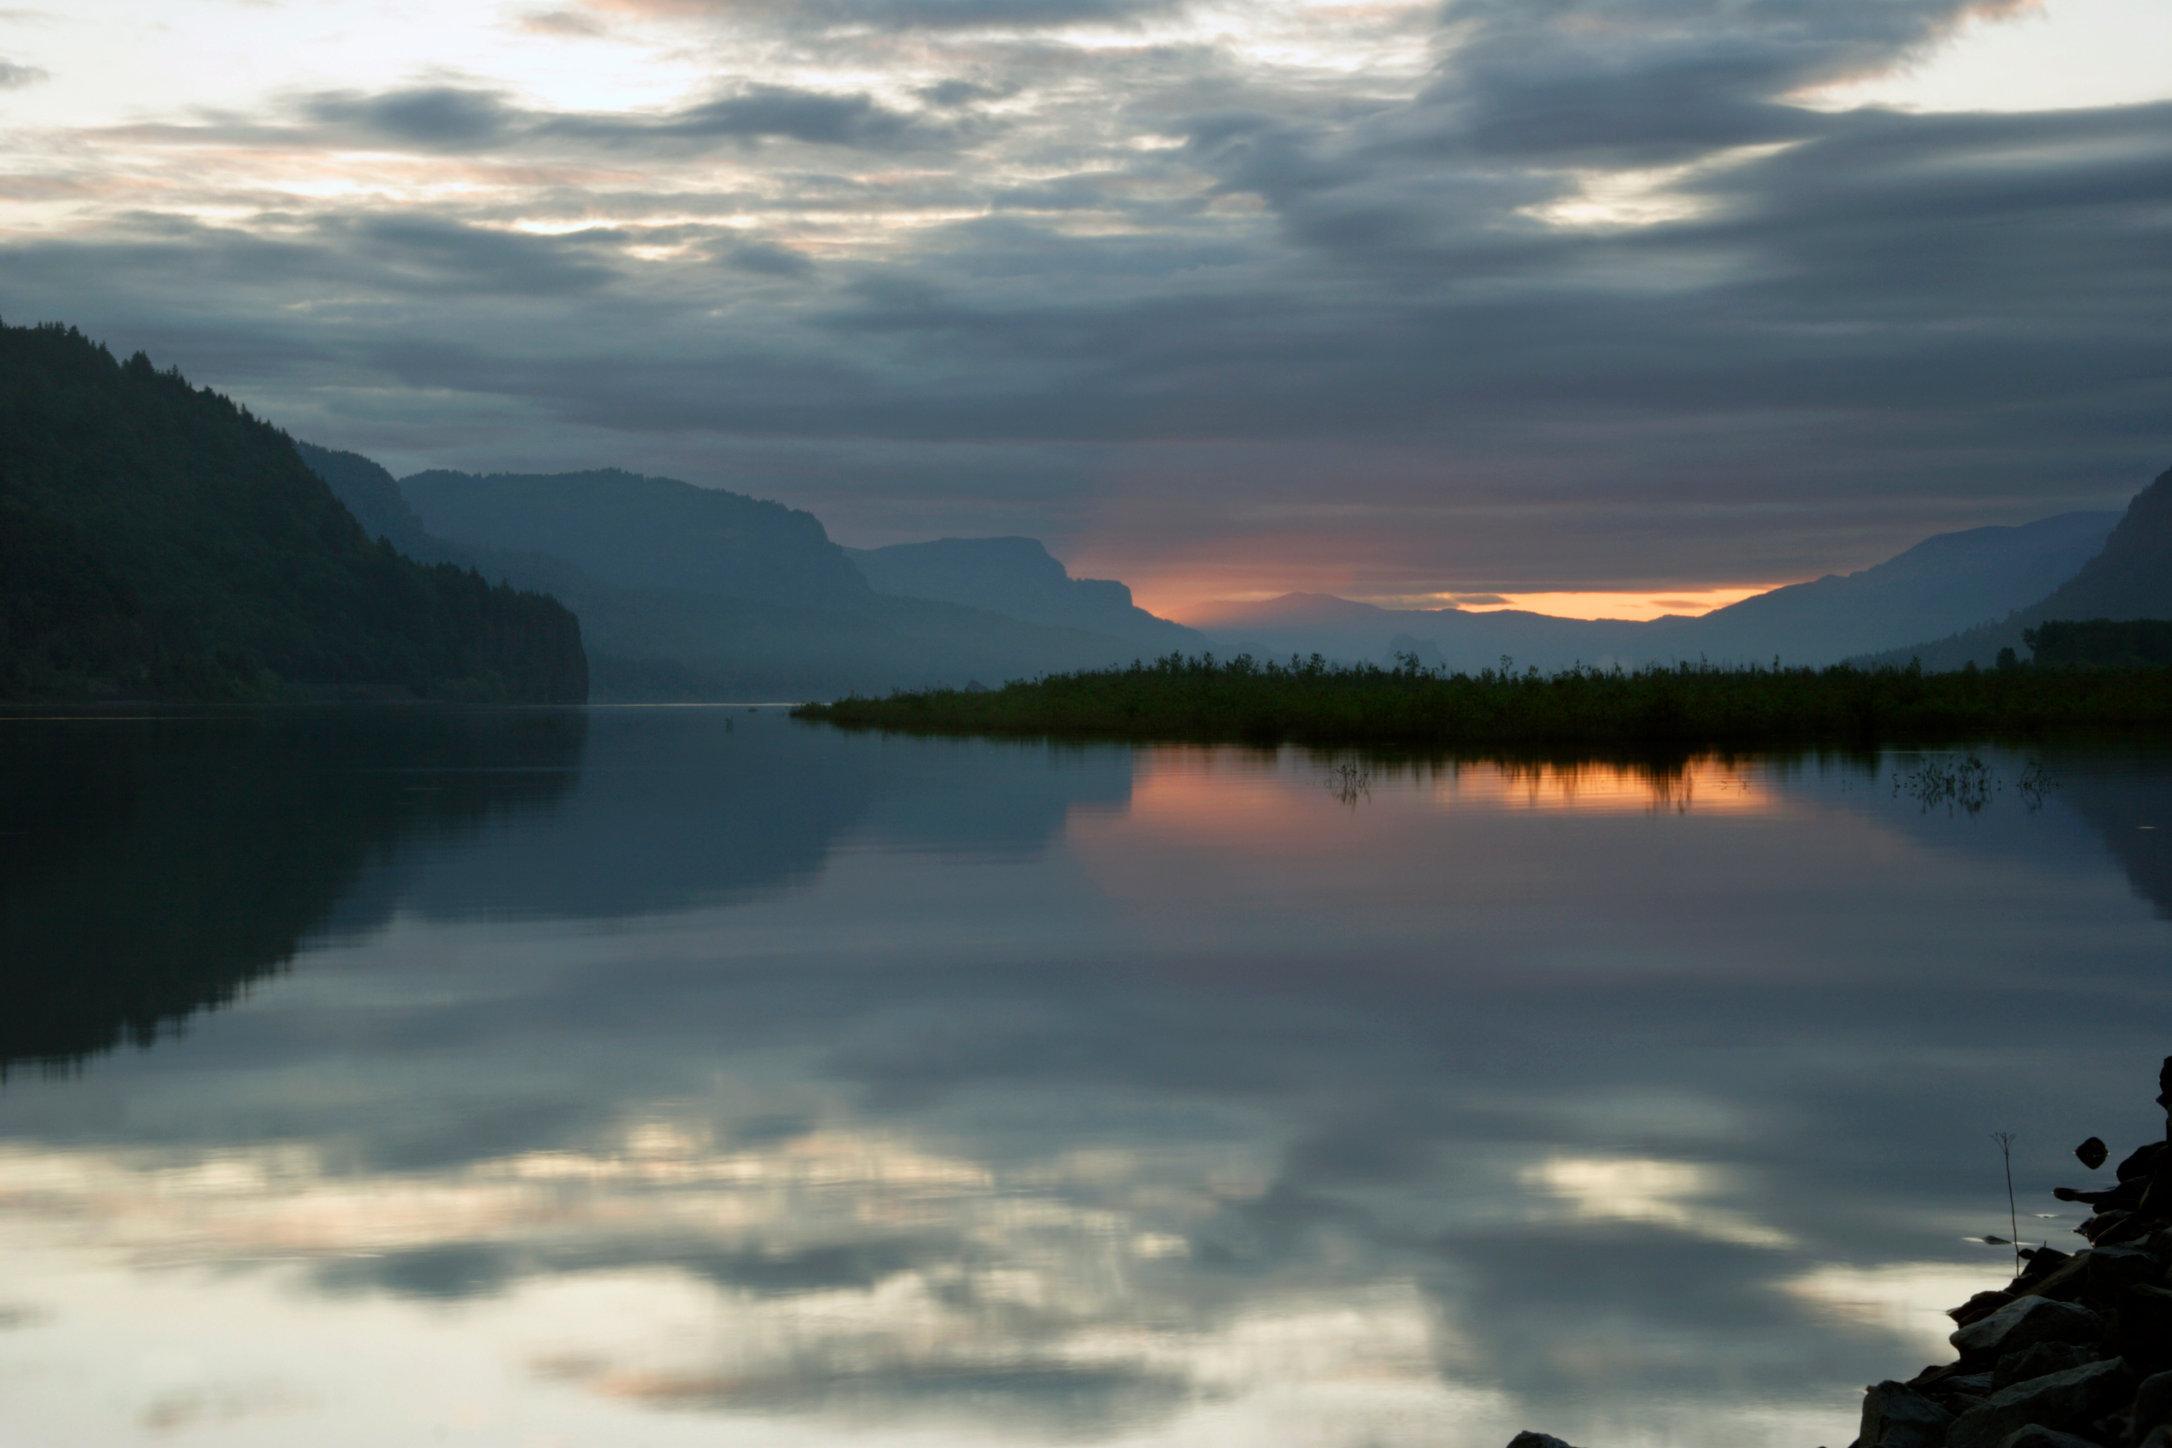 Sunrise, Columbia River Gorge, Oregon